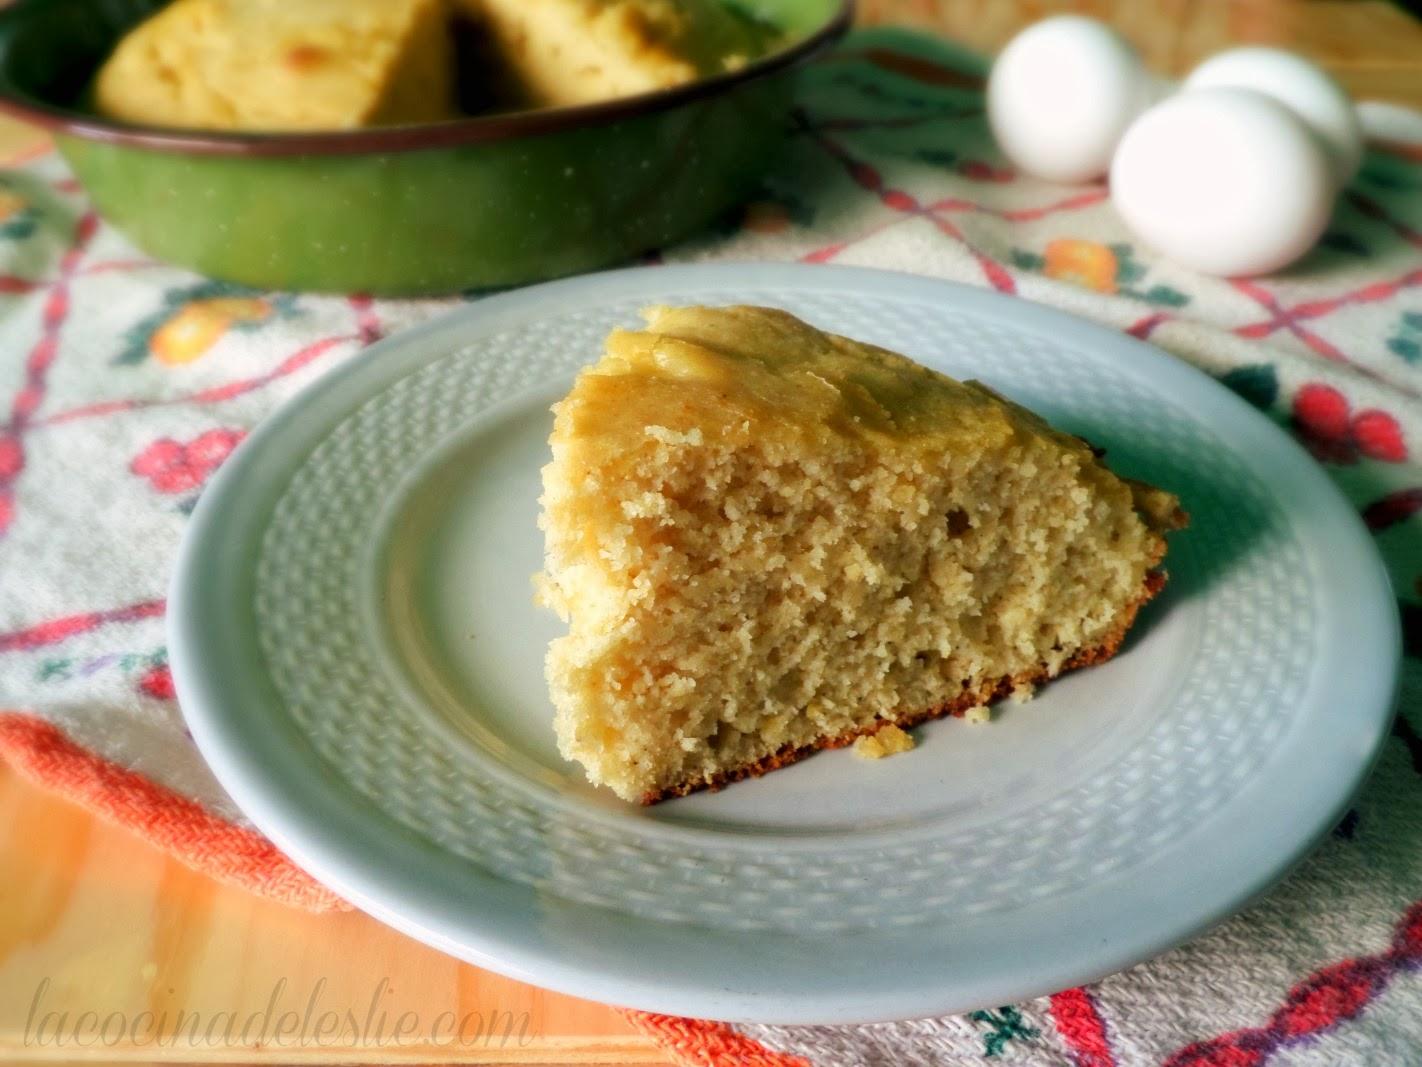 Classic Cornbread Recipe made w/ Maseca - lacocinadeleslie.com